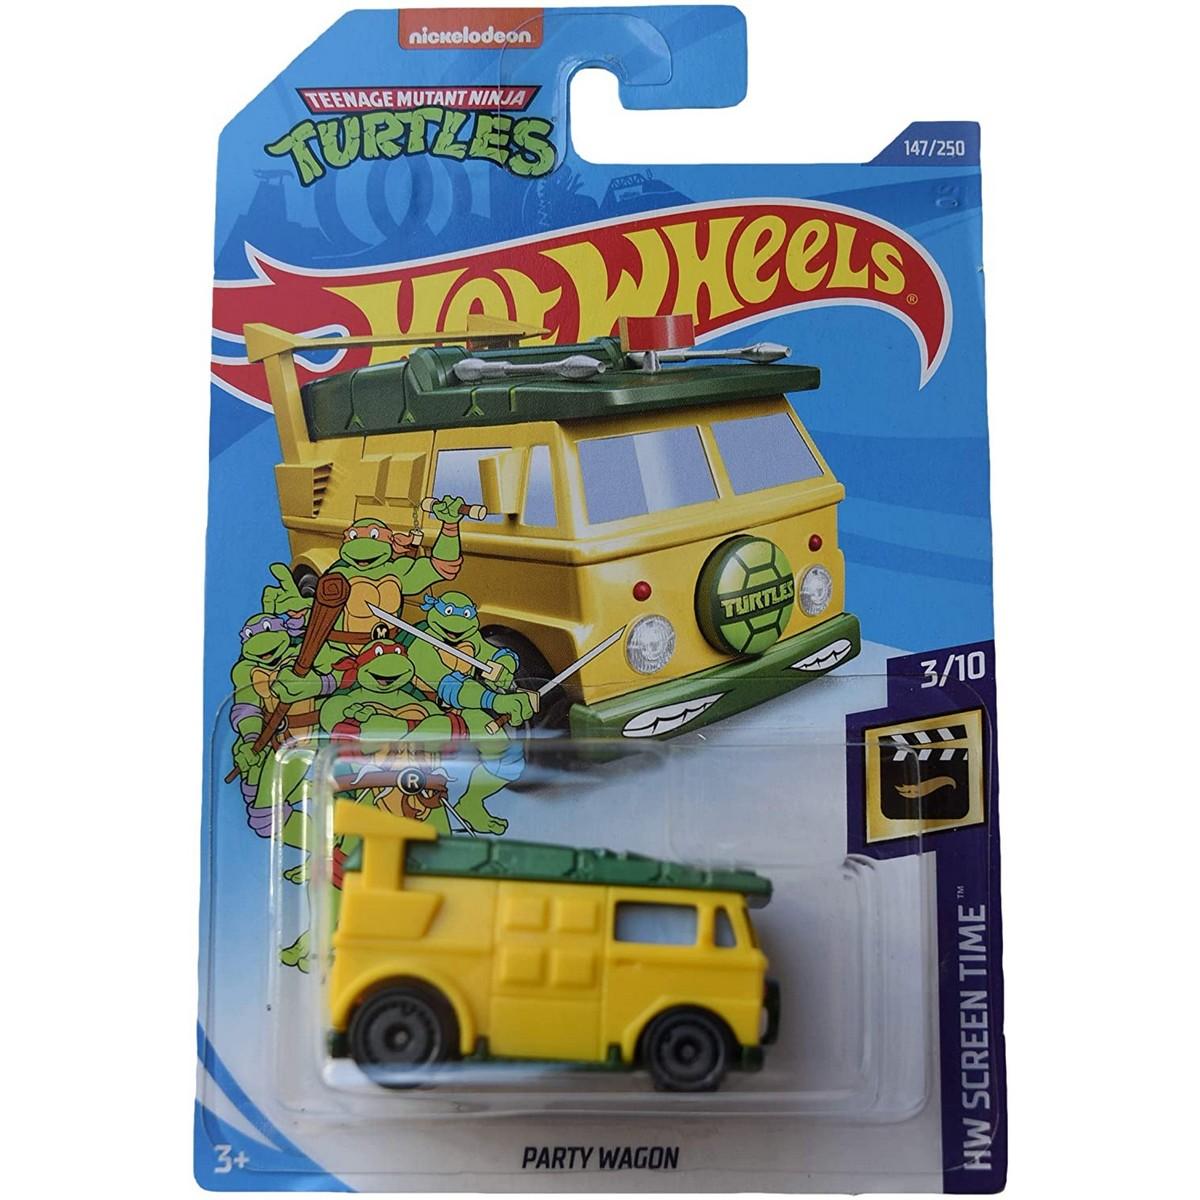 Hot Wheels Party Wagon Diecast Model